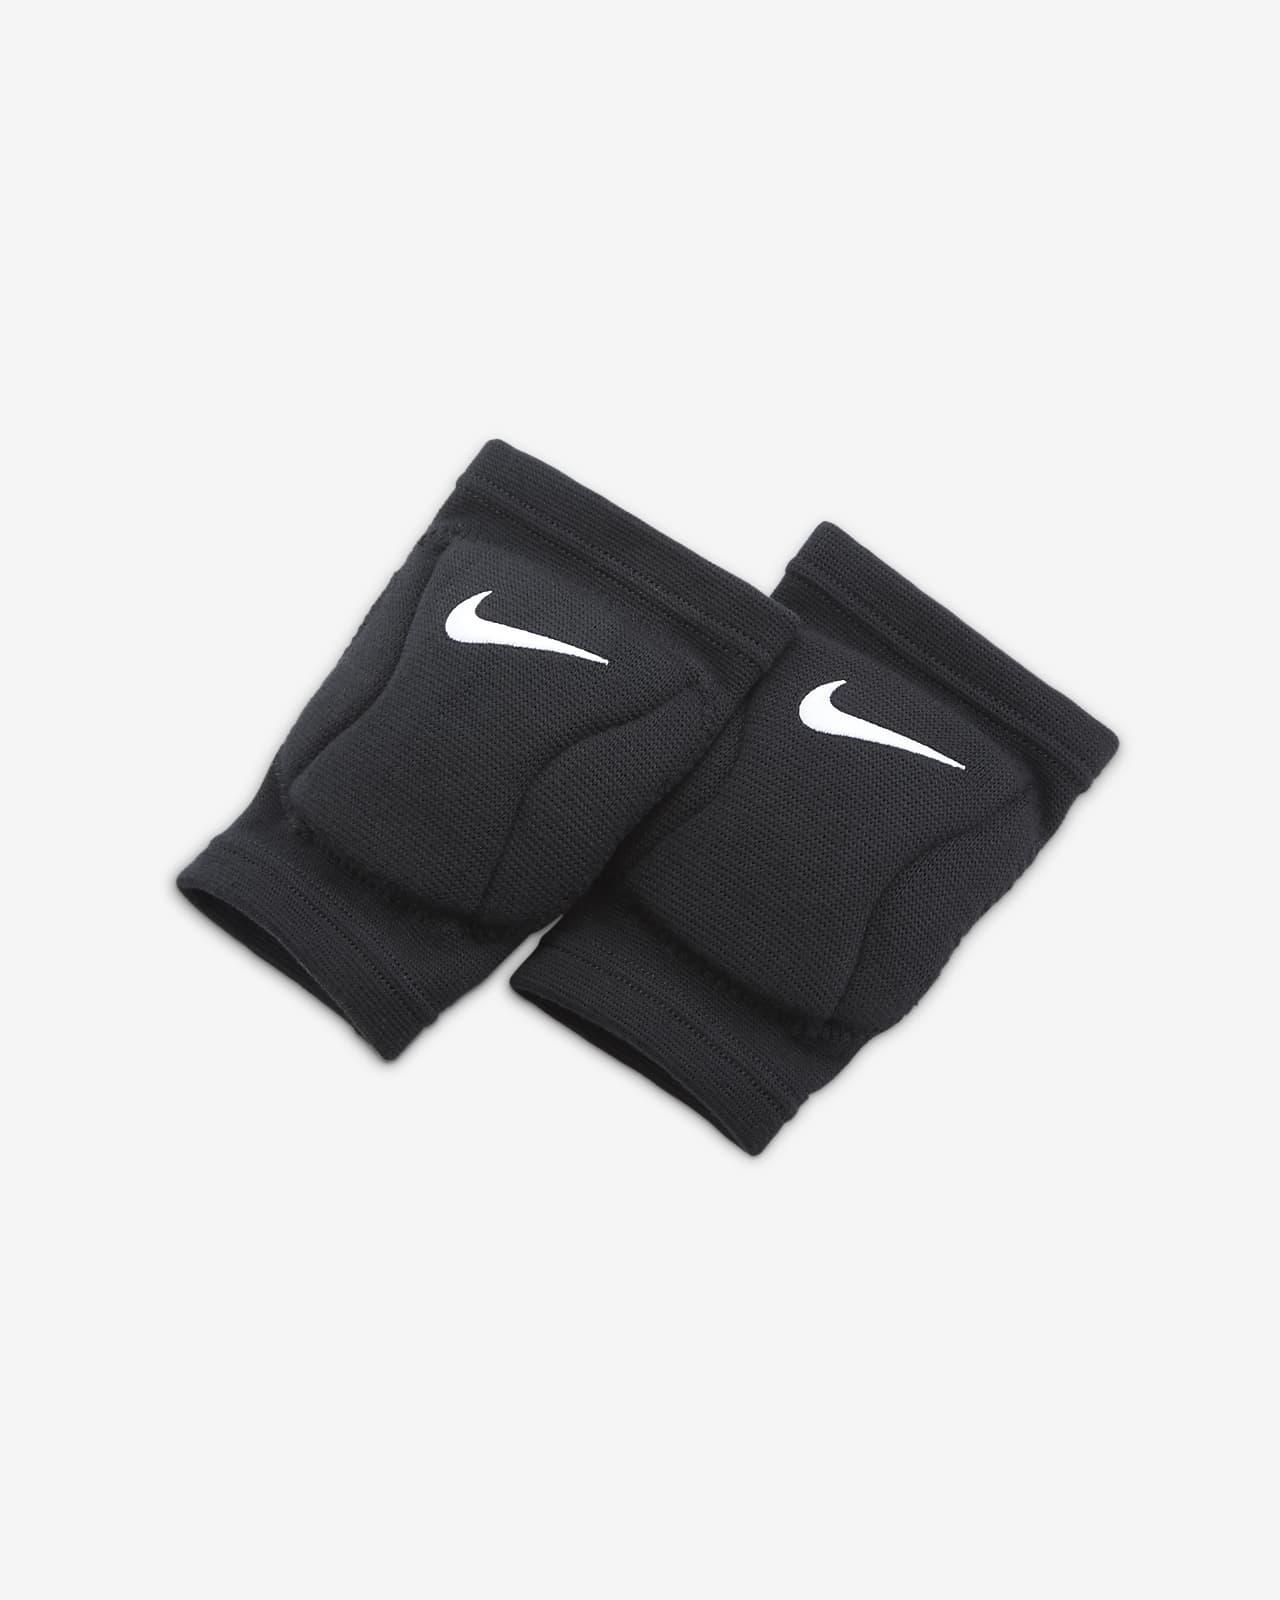 Rodilleras de vóleibol para niños Nike Streak